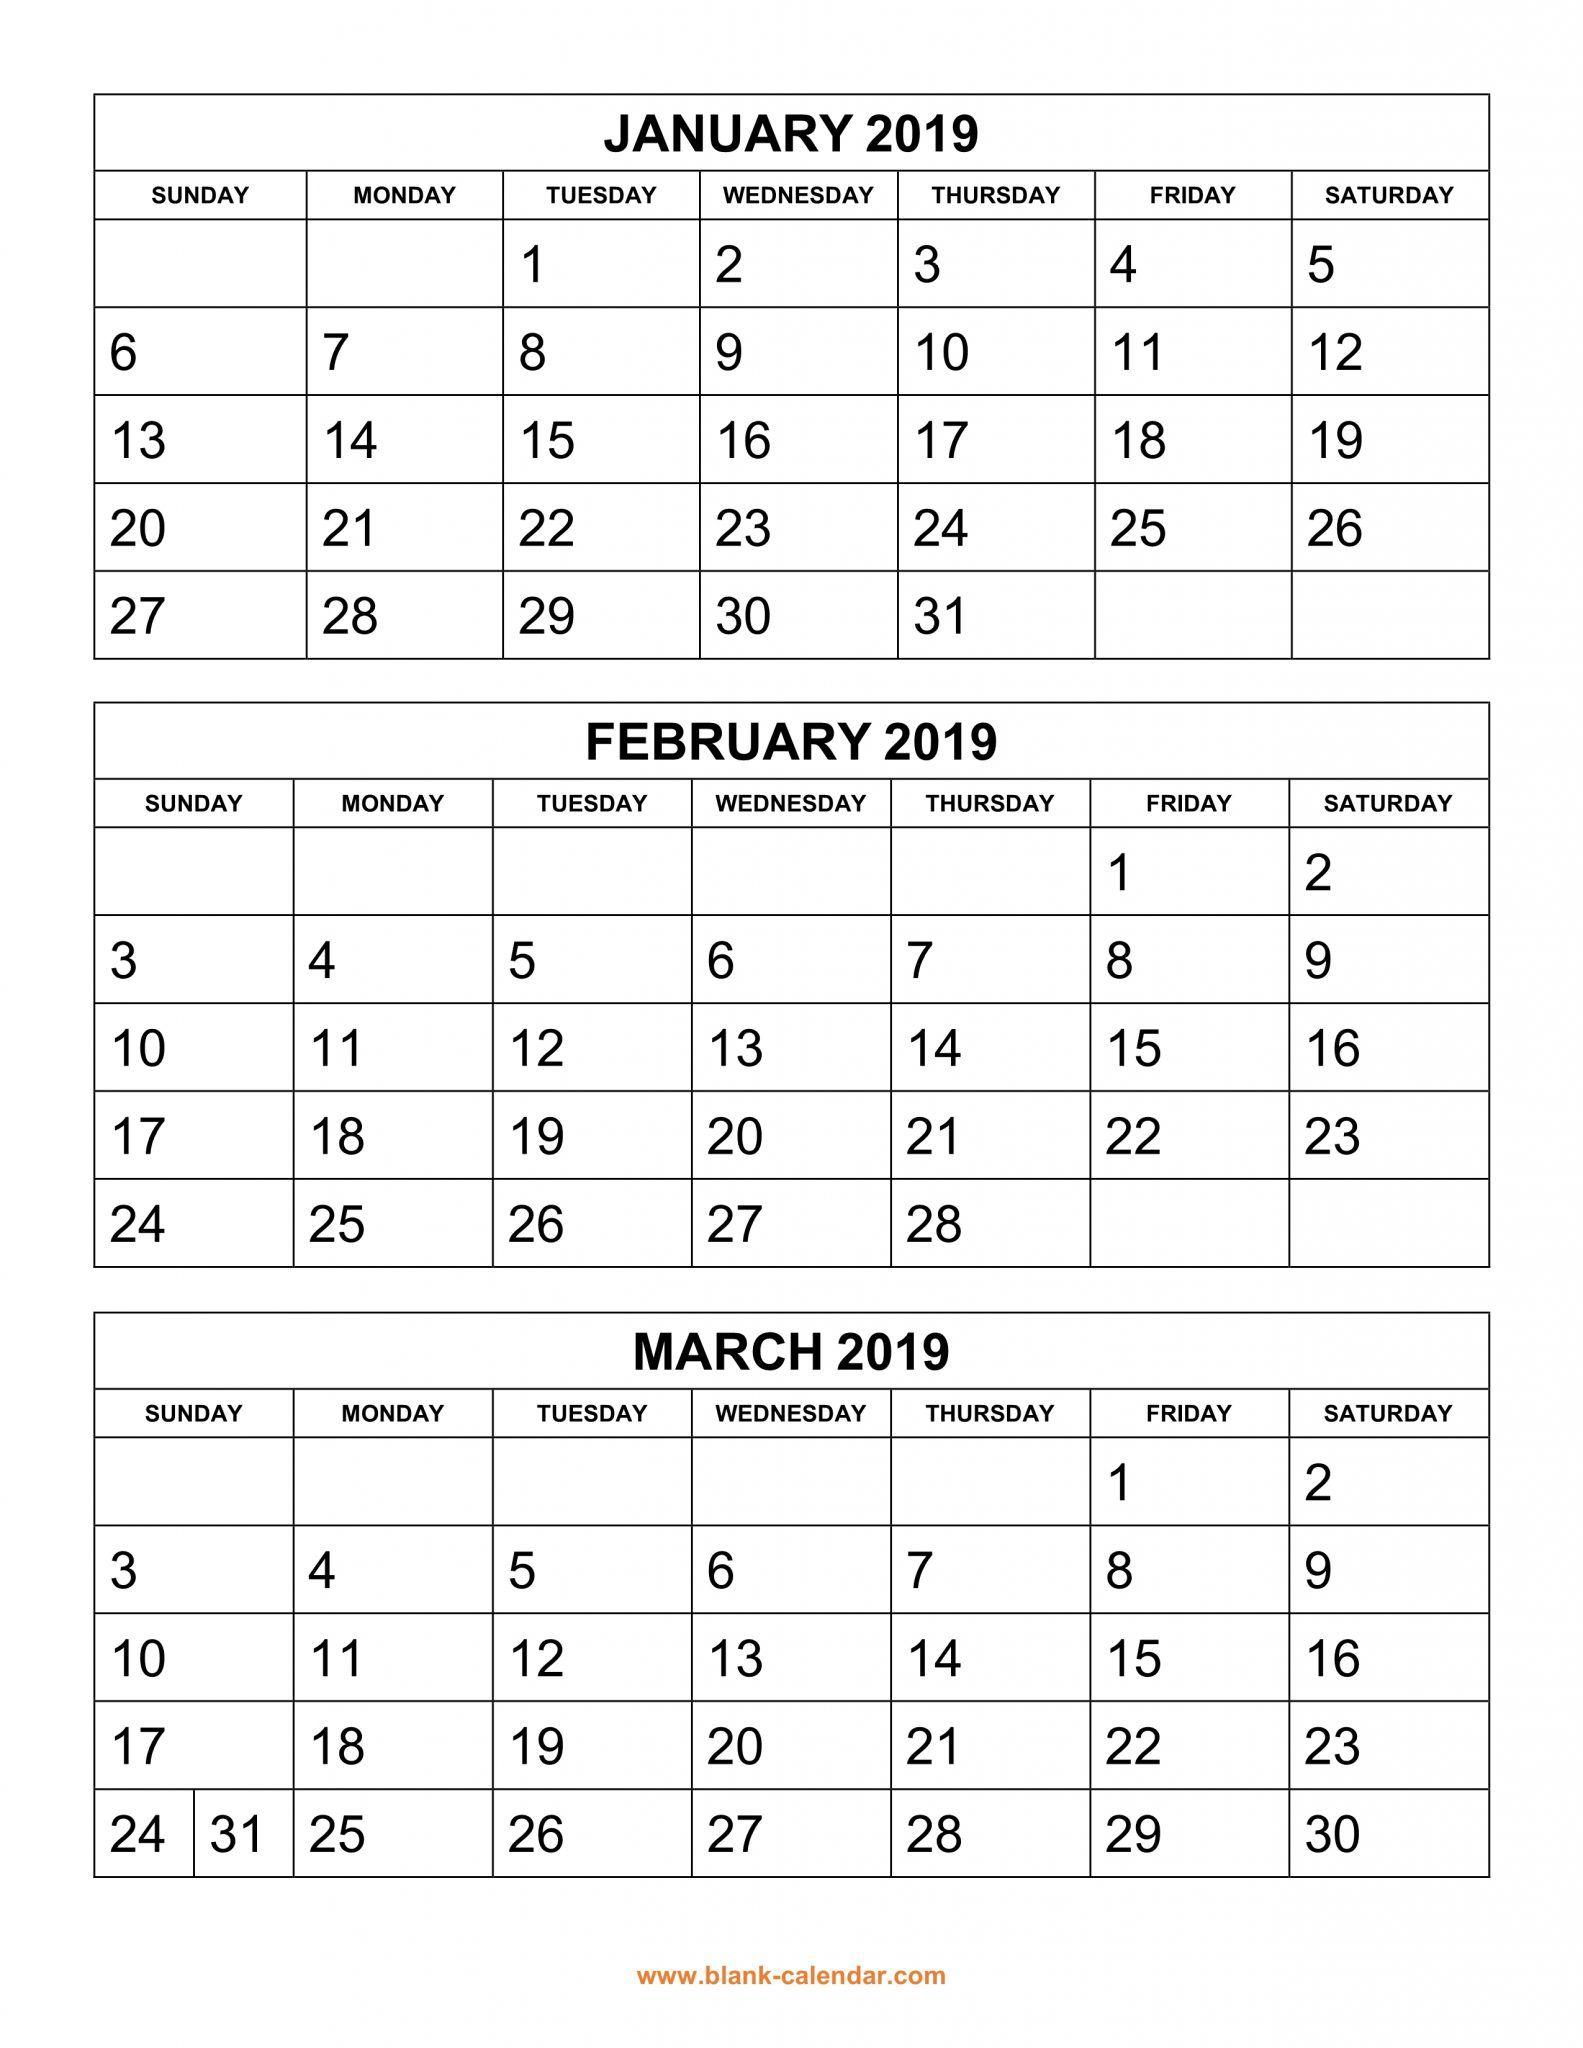 Get Free 2019 3 Month Calendar Templates Printable Download | Top 10 throughout Free Printable 3 Month Calendar Template